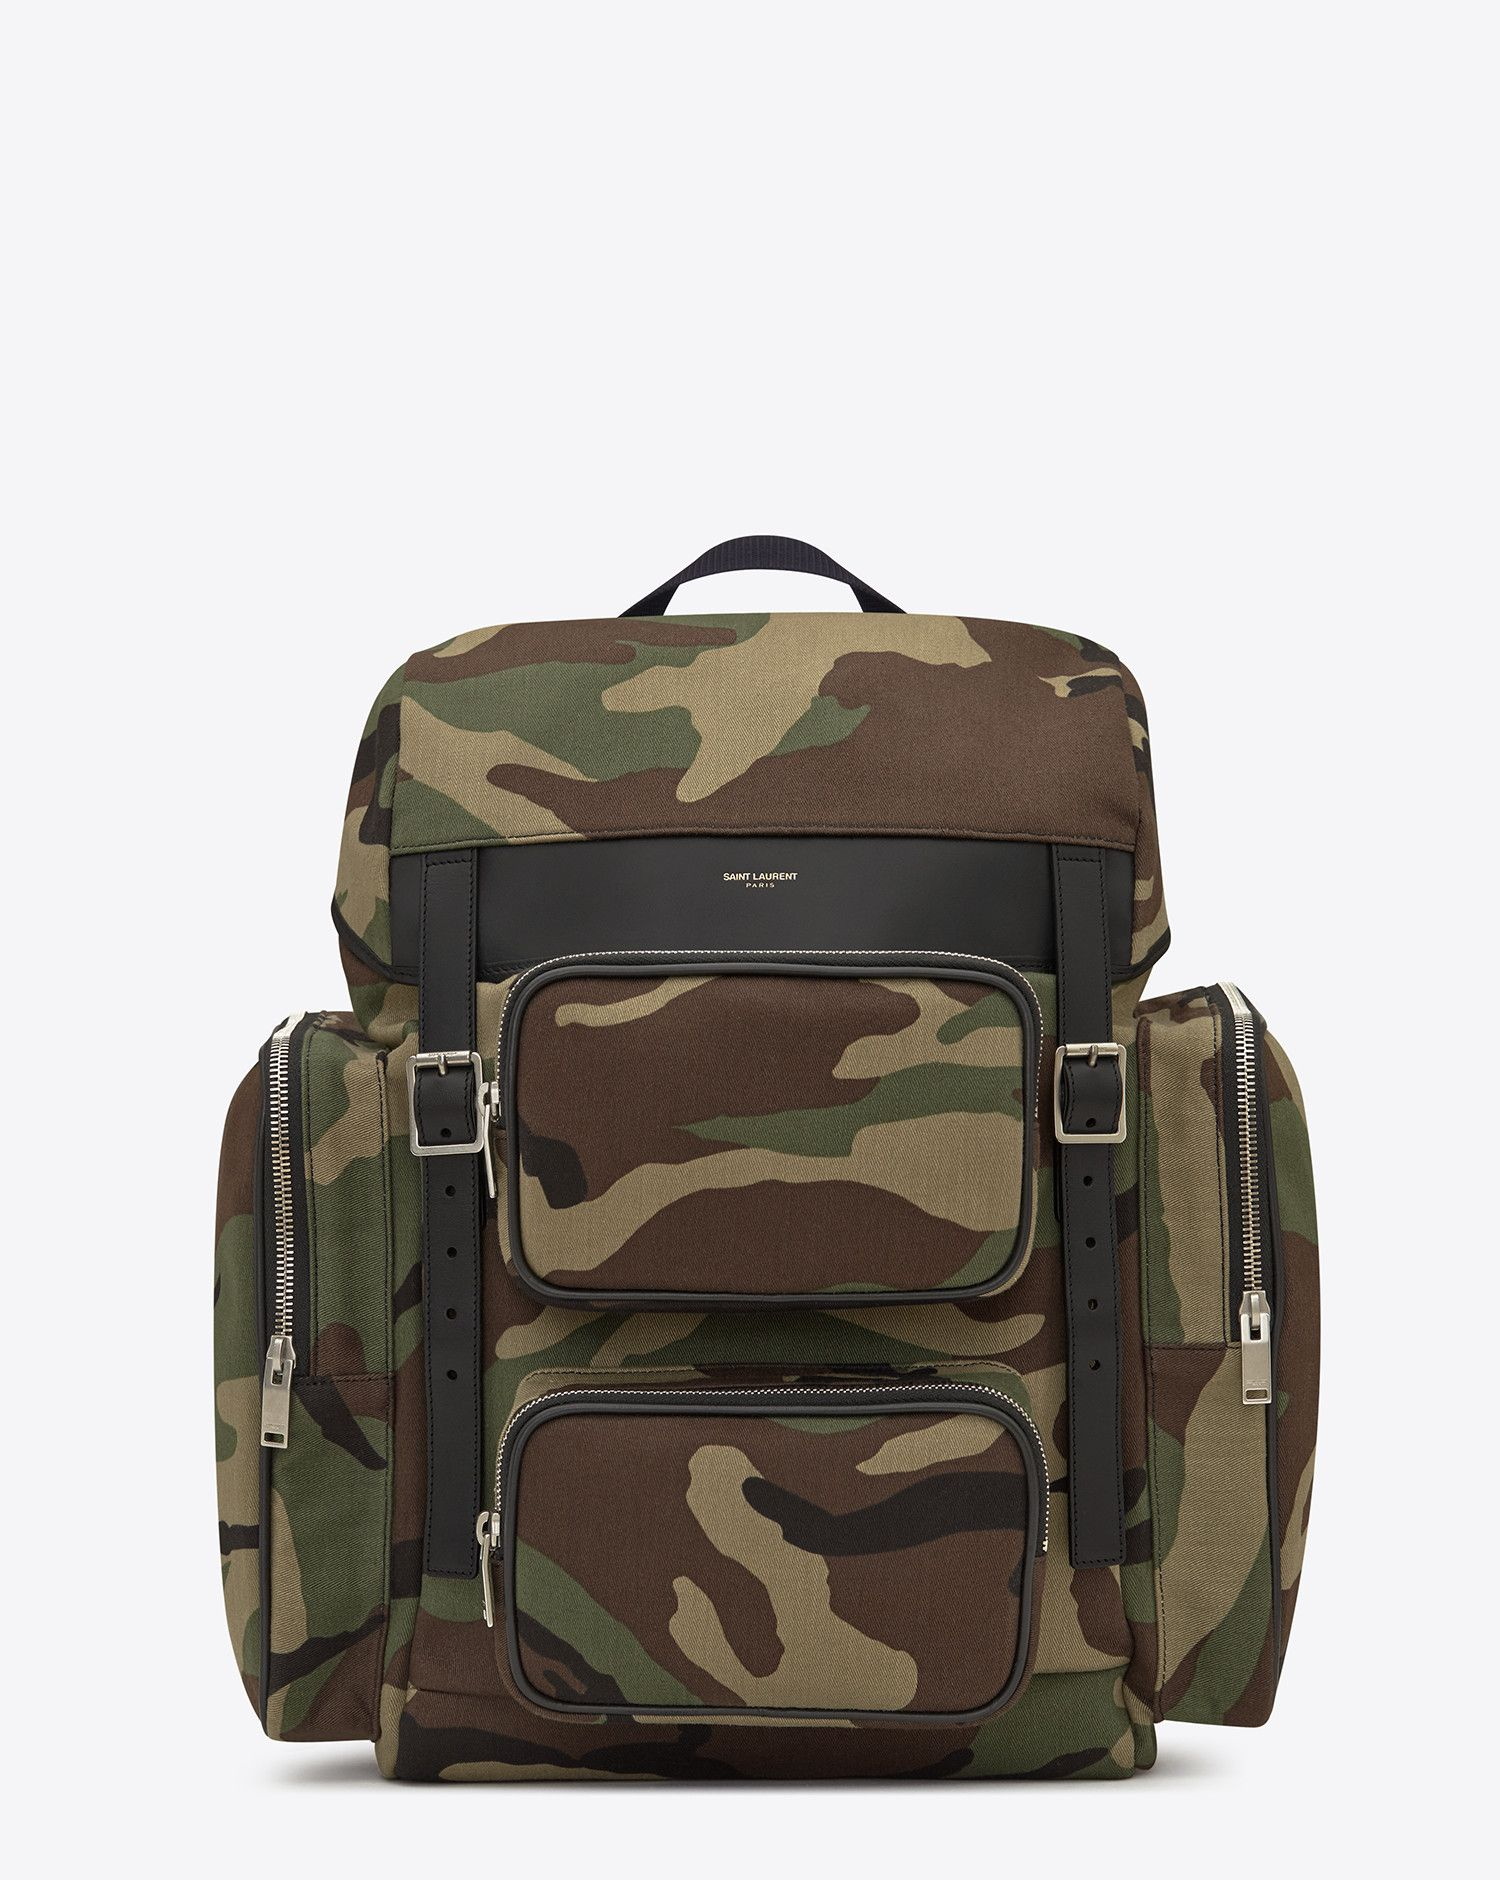 c793130808d Saint Laurent HUNTING Multi Pocket Rucksack In Camouflage Cotton Gabardine  And Black Leather